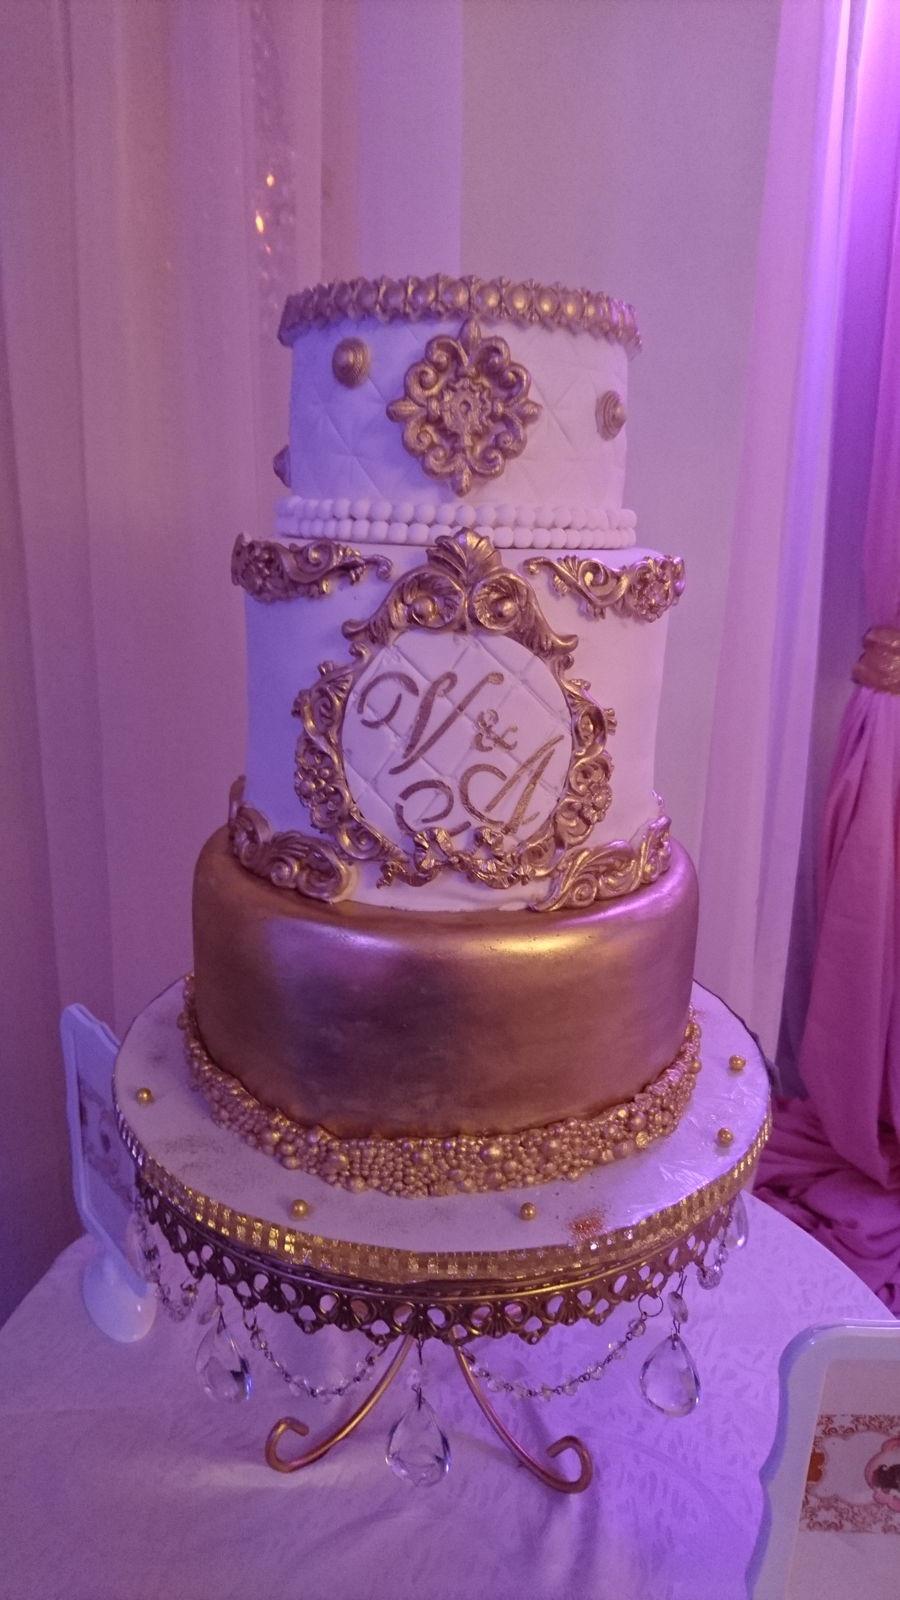 Wedding Cake Gold And White  Elegant Baroque Vintage White & Gold Wedding Cake